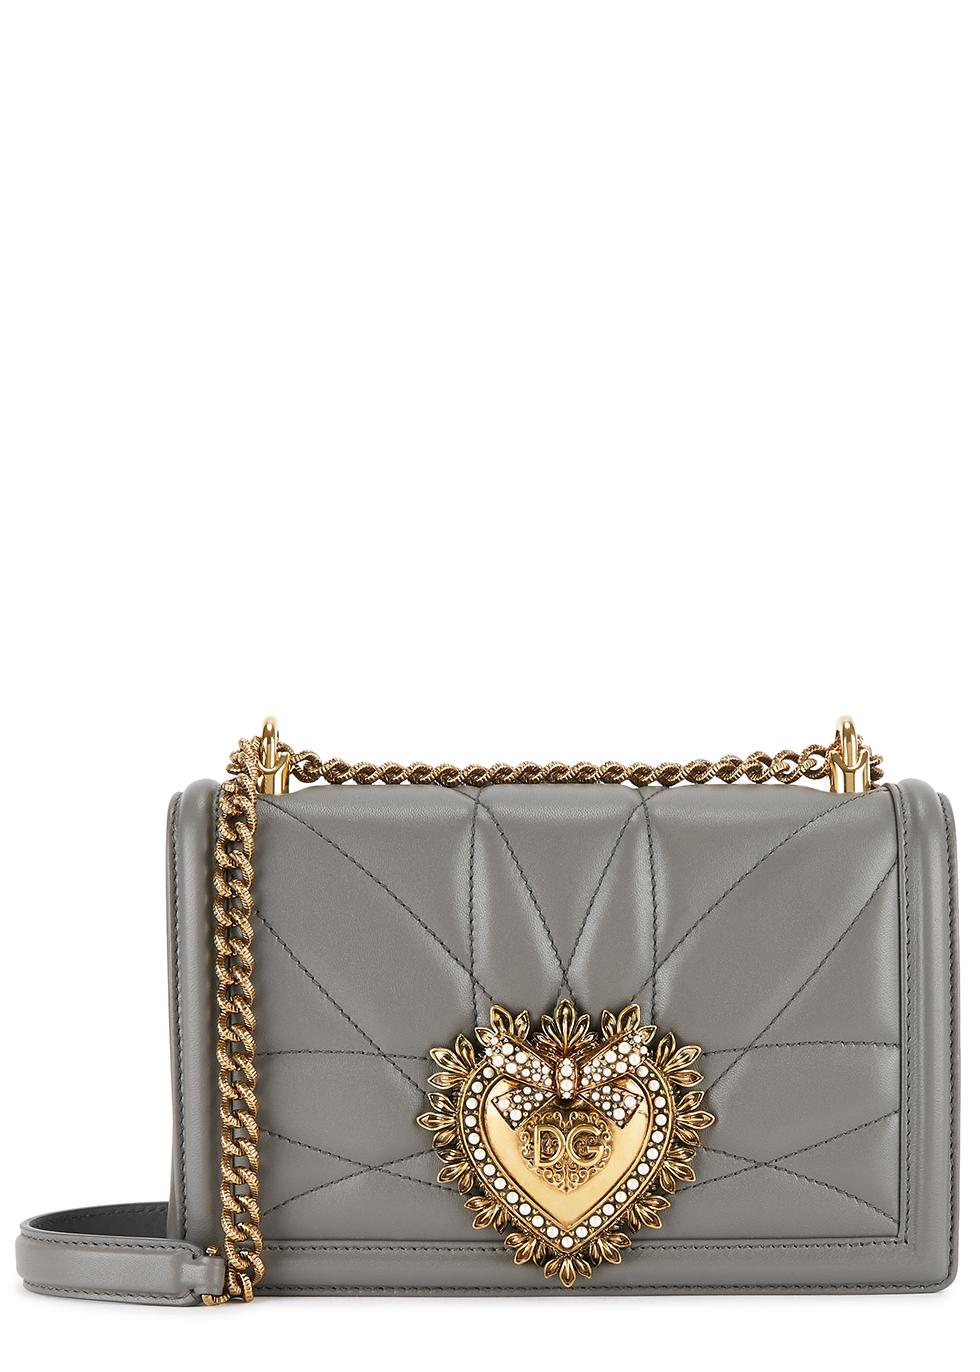 Women's Designer Bags, Handbags and Purses